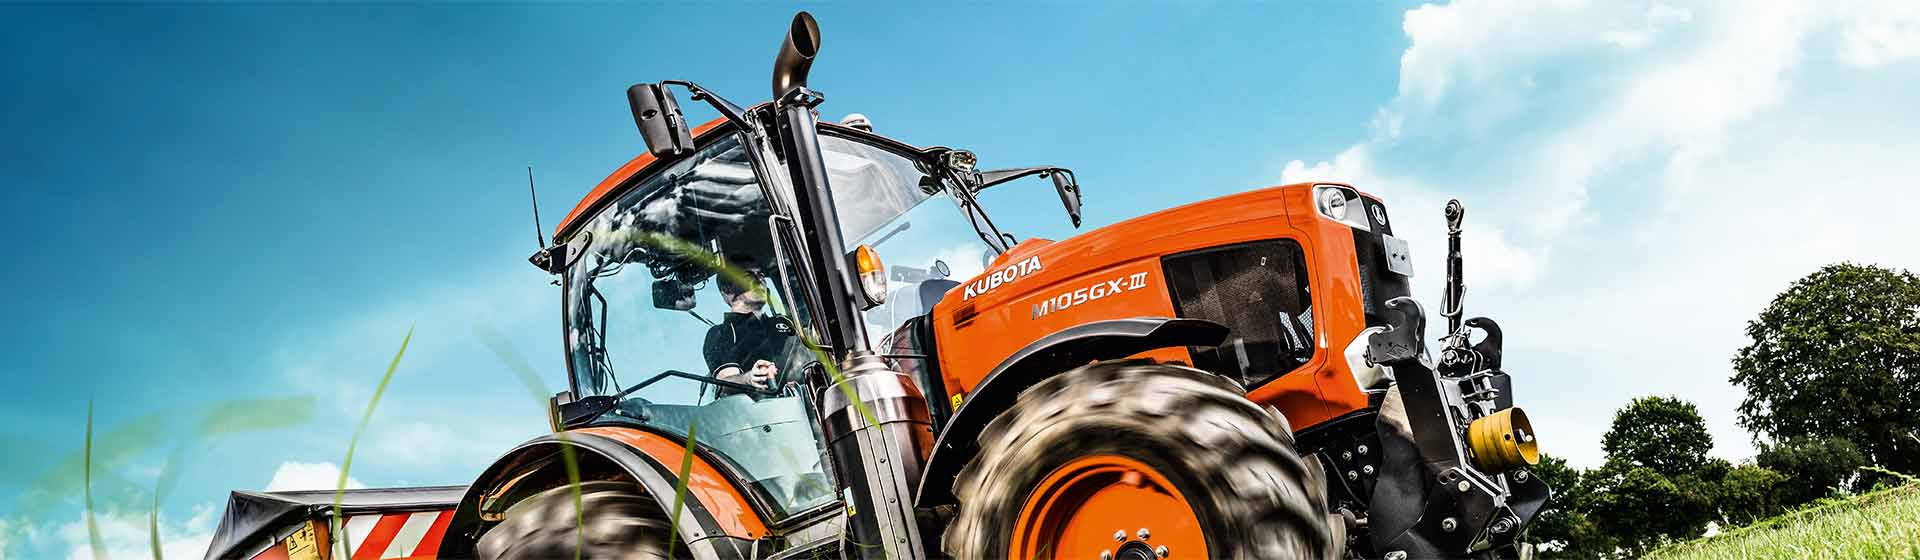 Kubota M-Traktoren